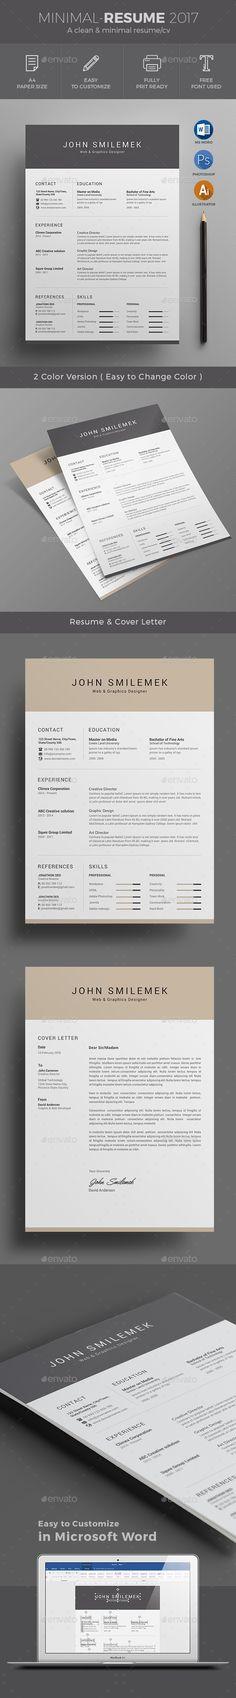 best resume template malaysia resumecurriculum vitae template msn scholarship in sample resume